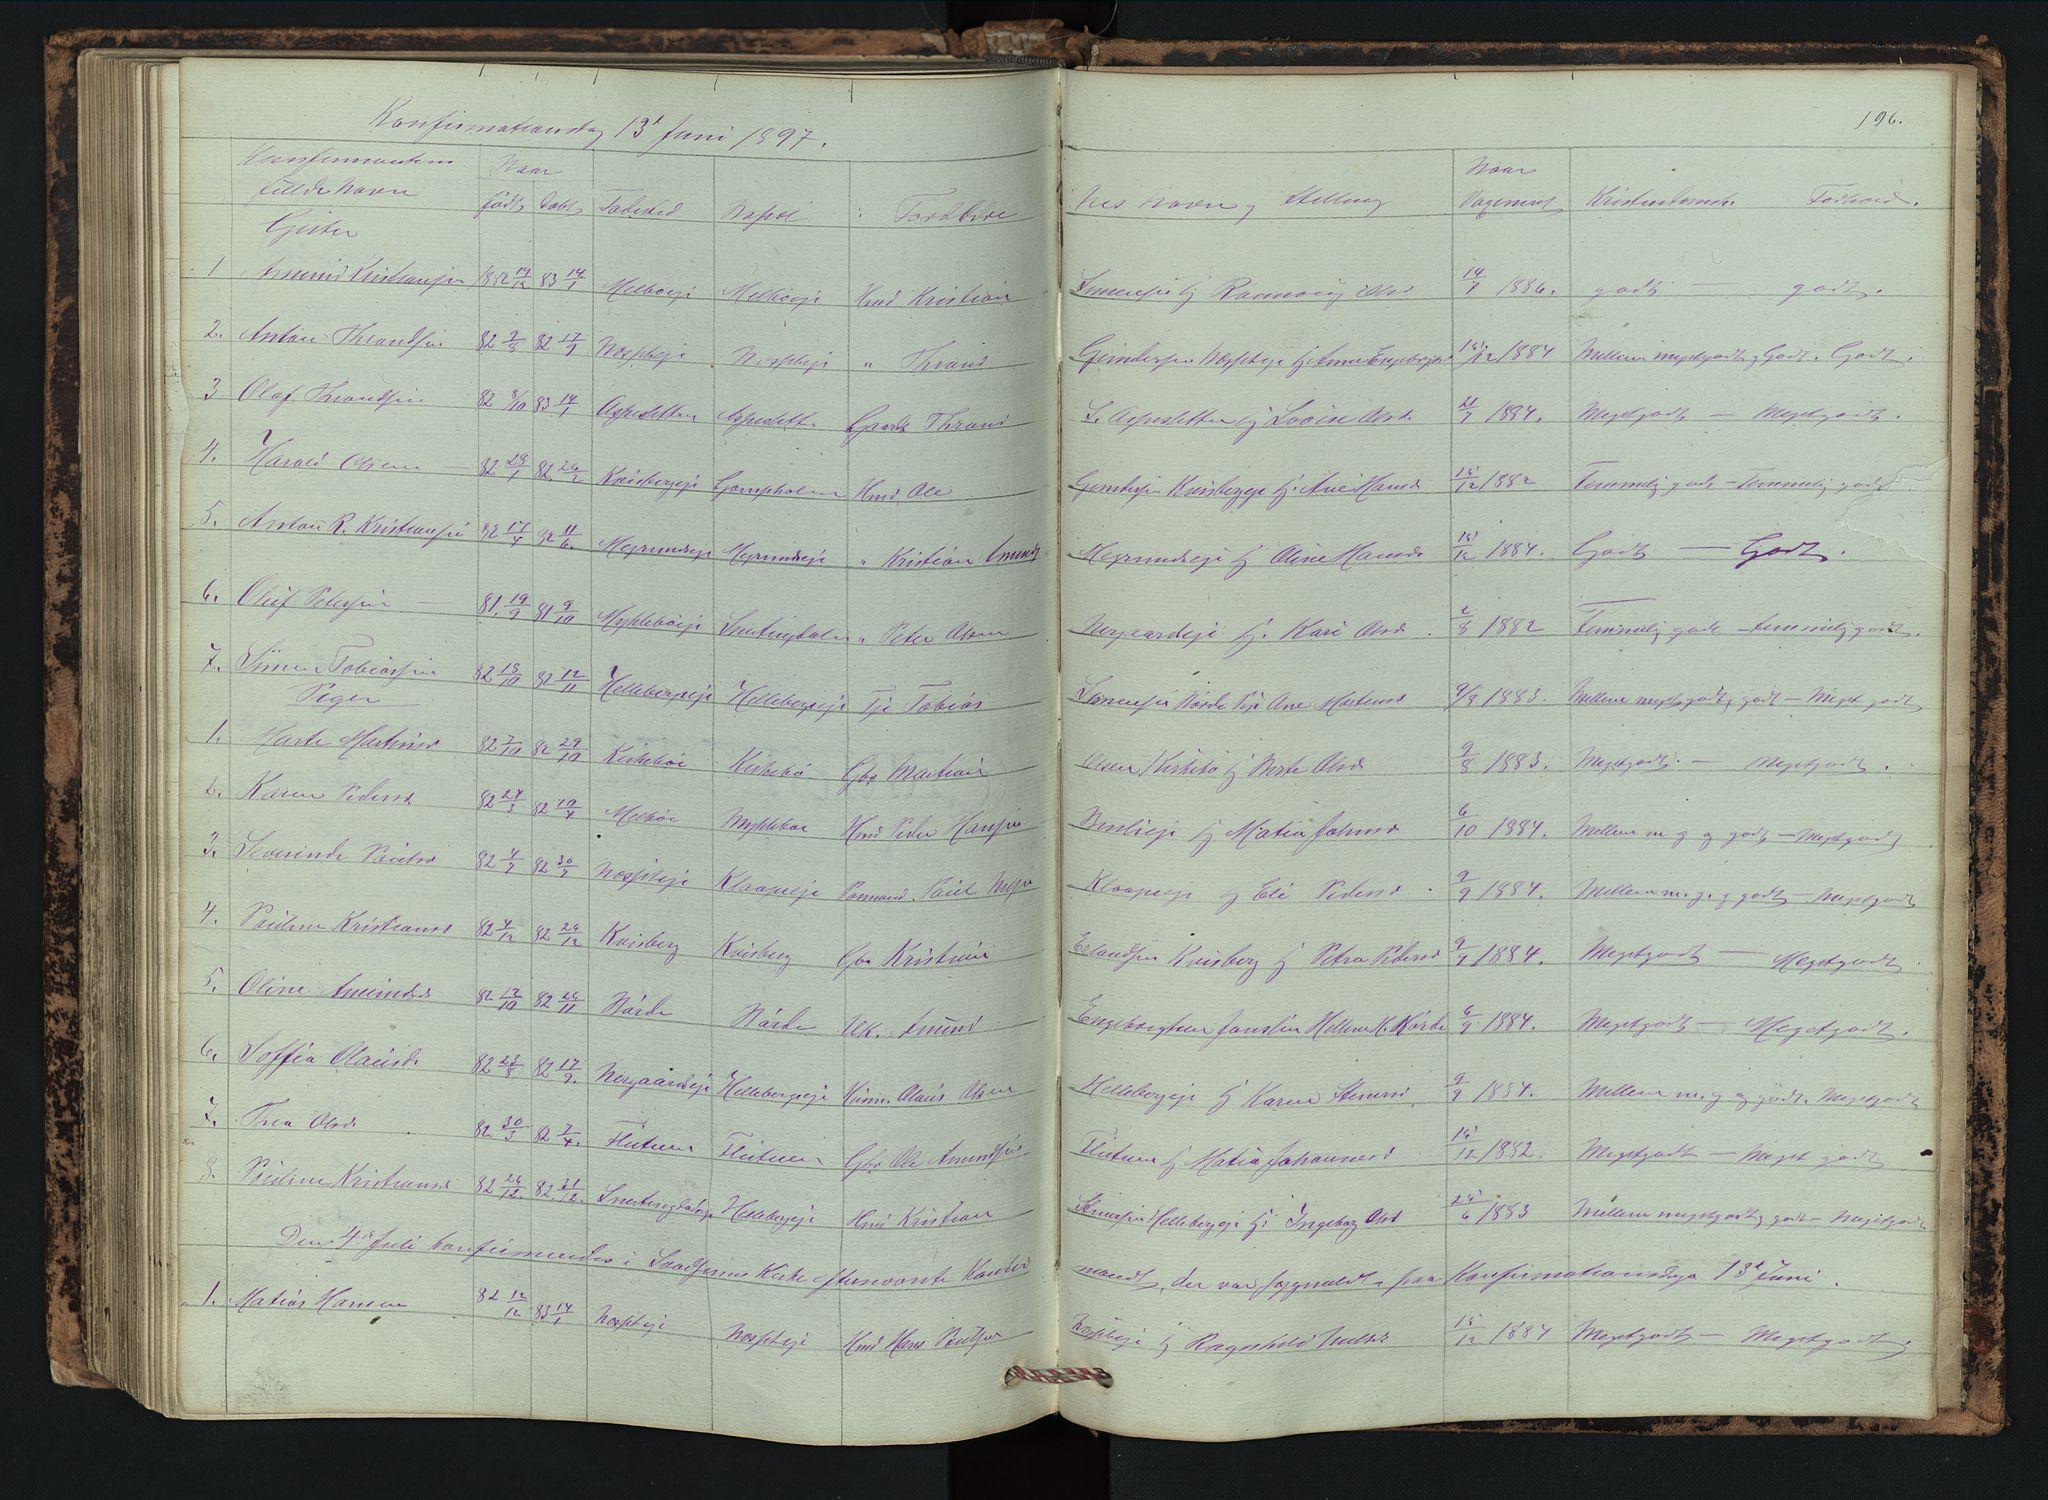 SAH, Vestre Gausdal prestekontor, Klokkerbok nr. 2, 1874-1897, s. 196